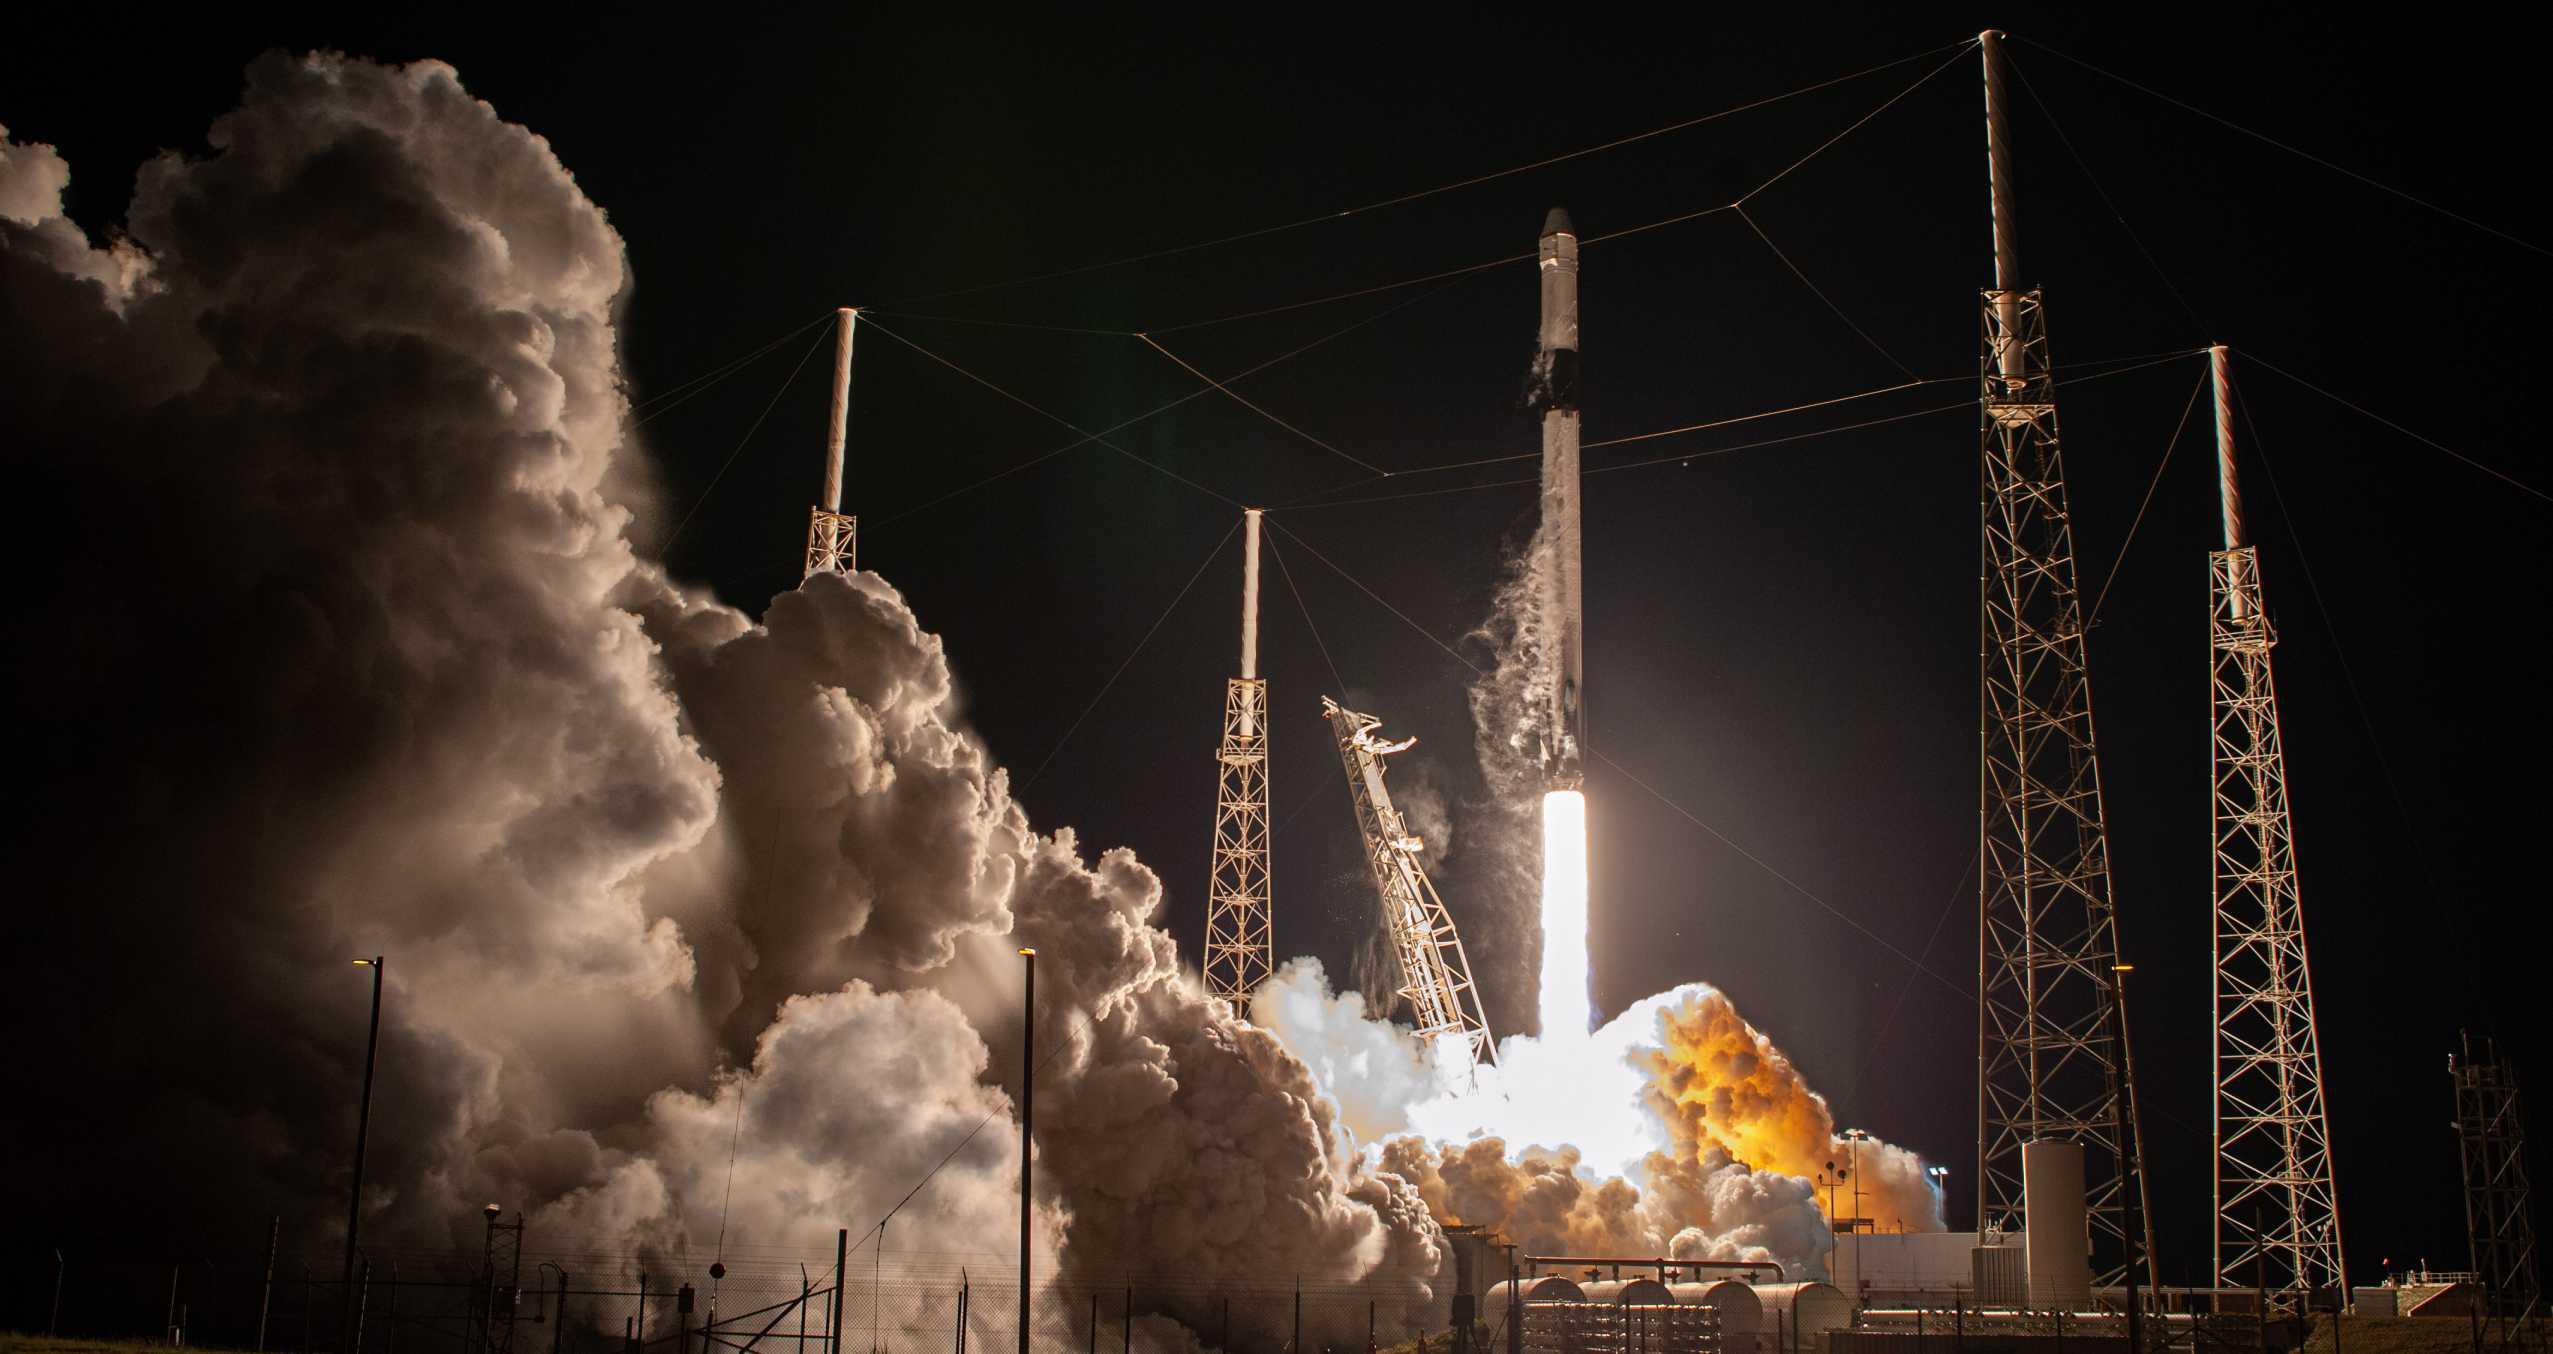 CRS-20 Dragon C112 F9 B1059 030720 (NASA) launch 2 crop (c)